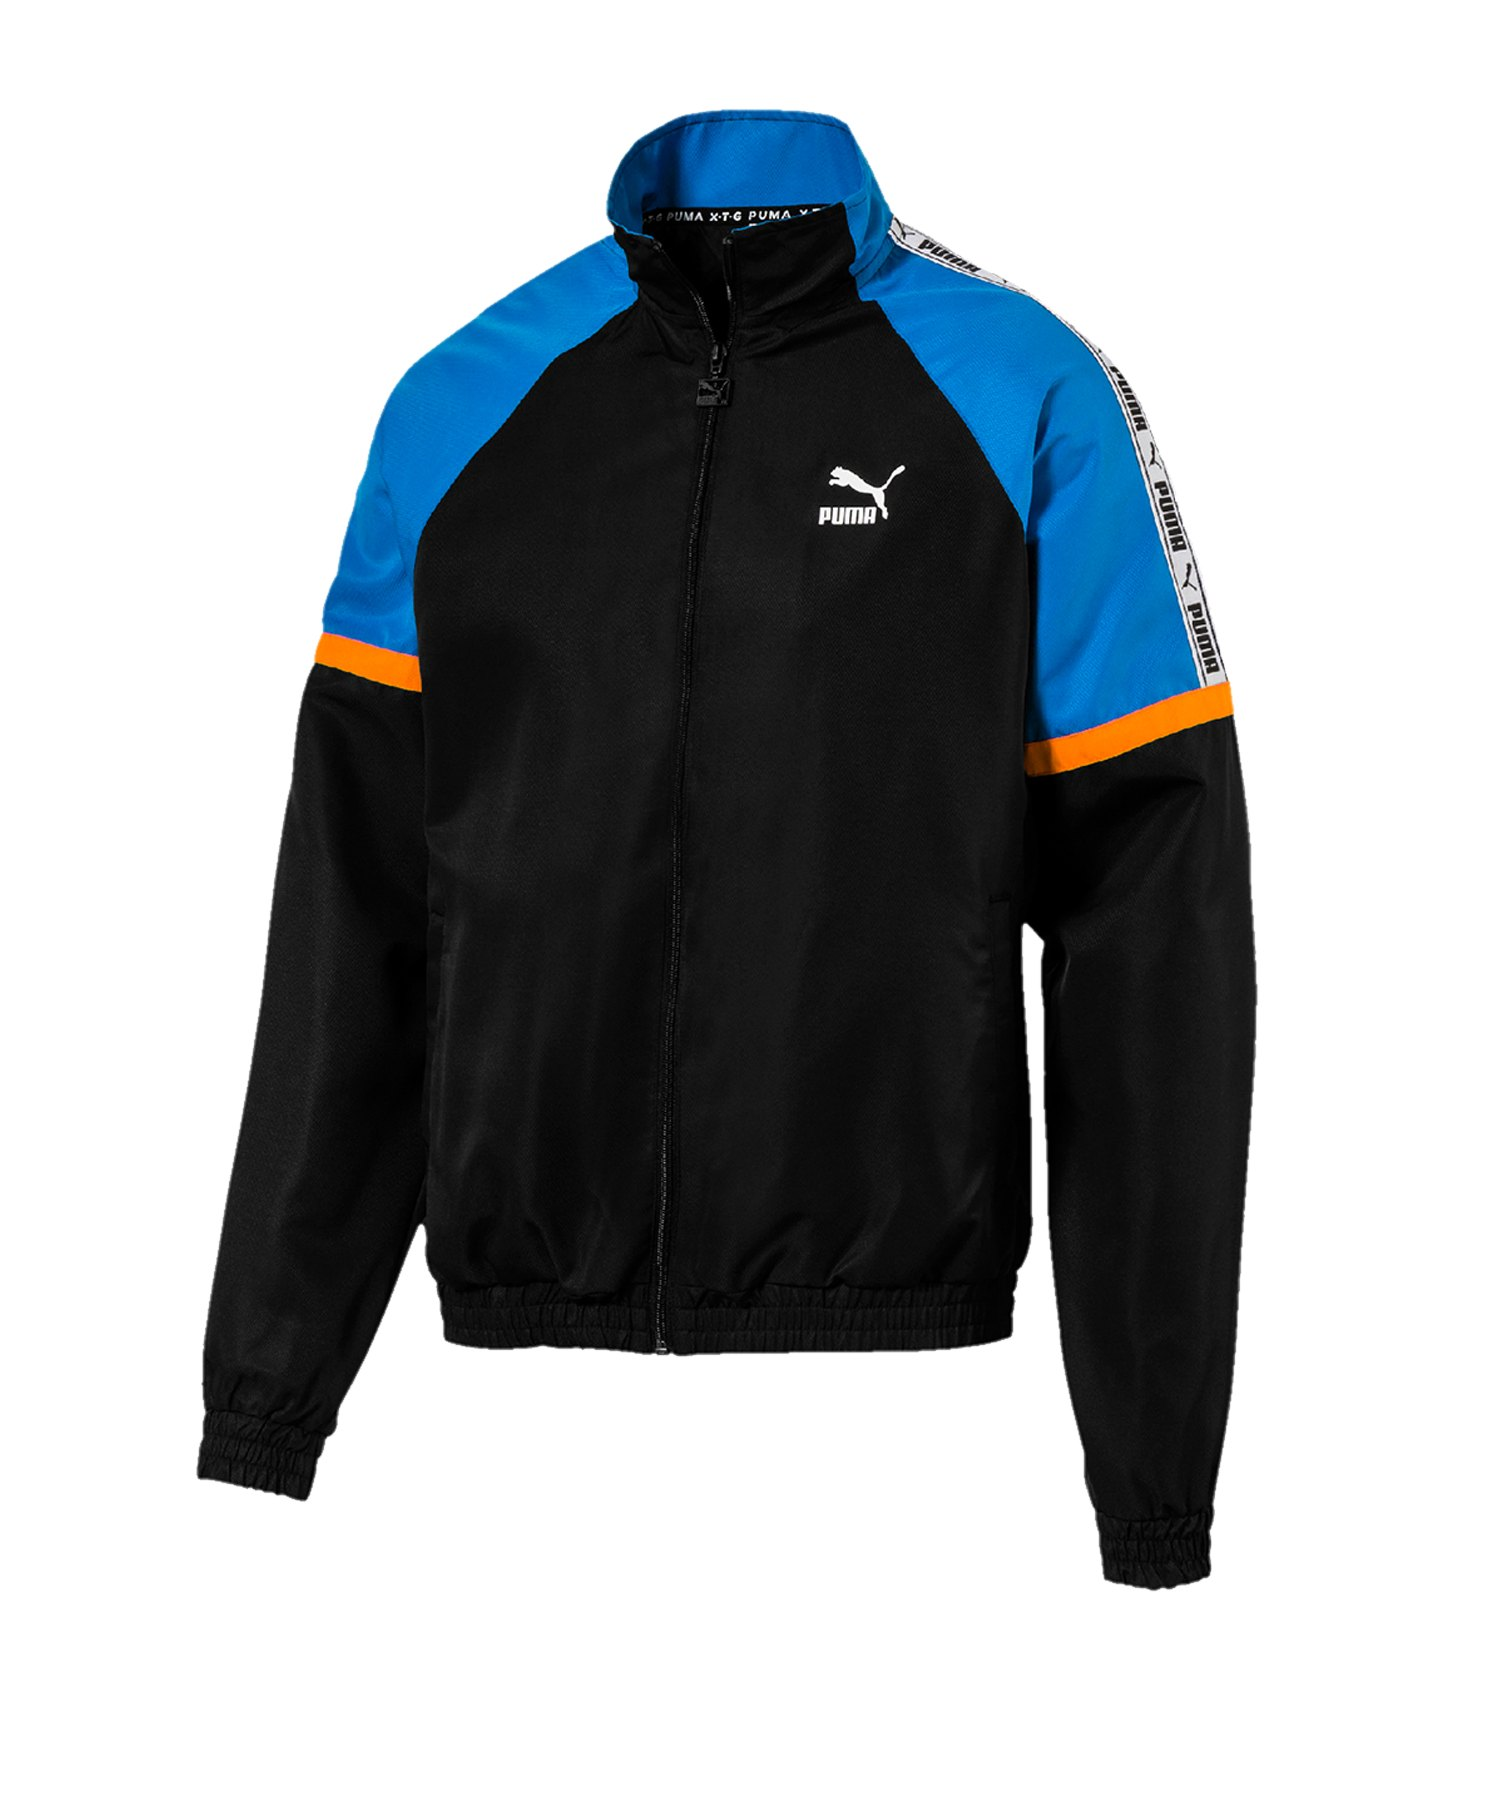 PUMA XTG Woven Jacket Jacke Schwarz F01 - schwarz